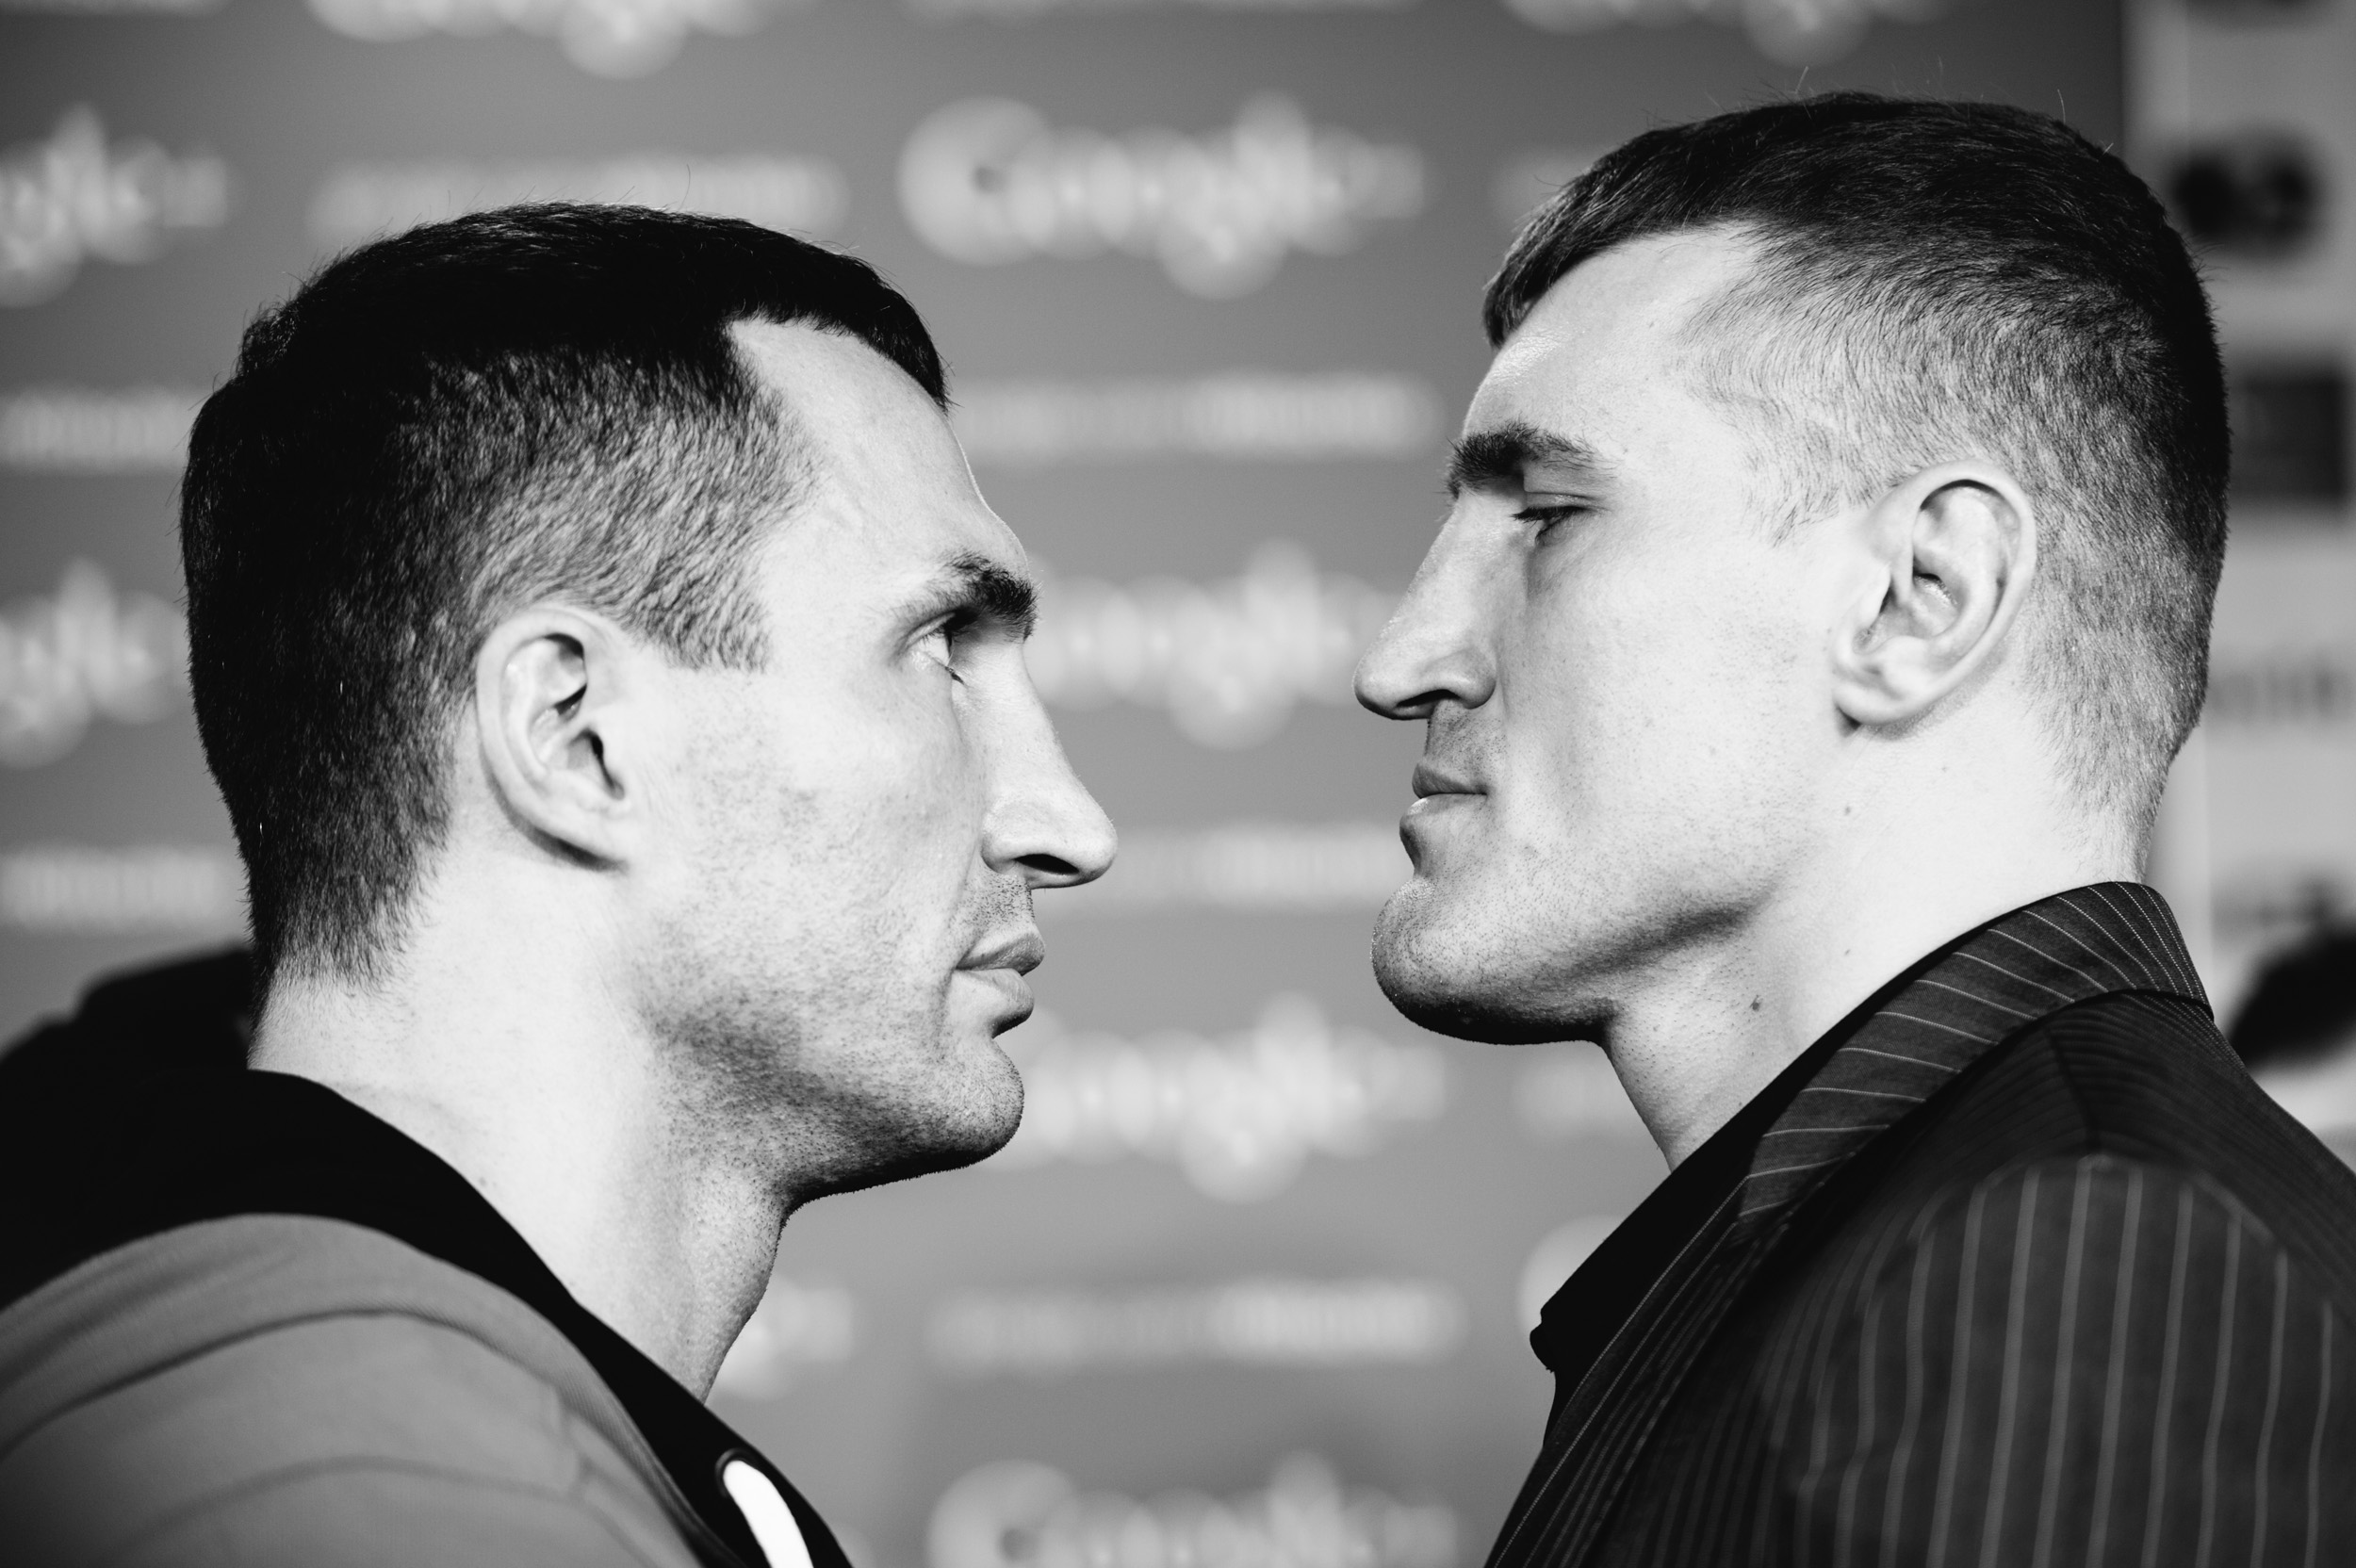 Esame di polacco per Wladimir Klitschko